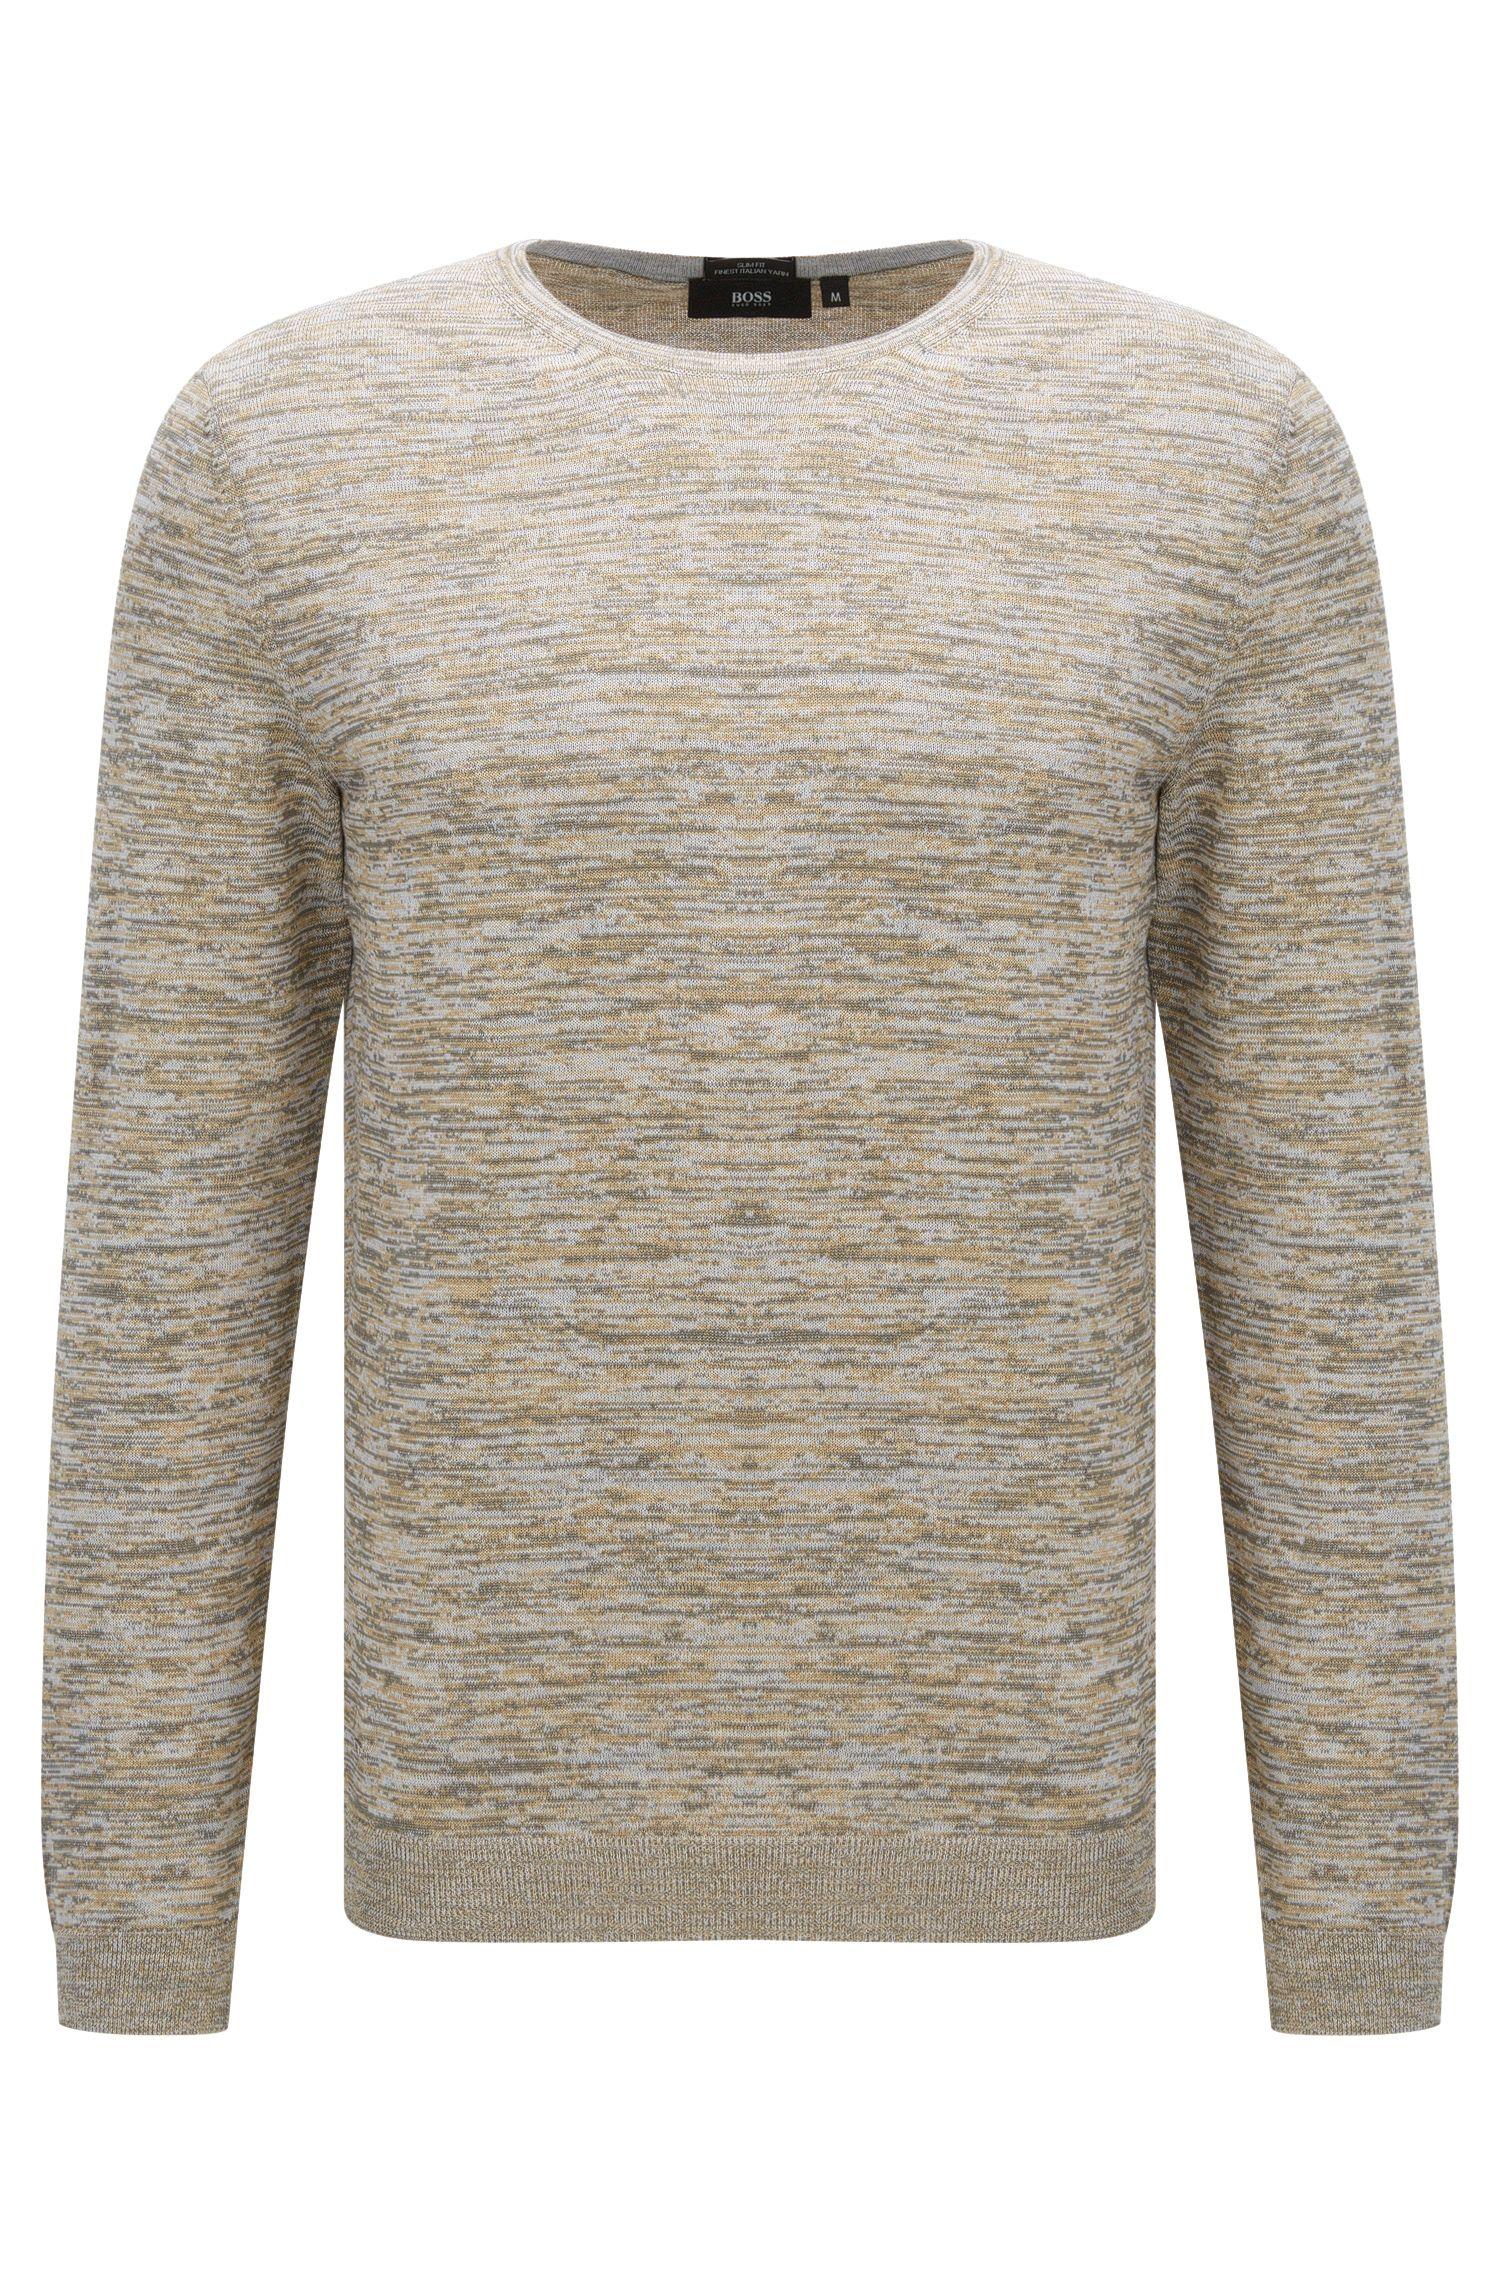 Italian Cotton Sweater | Fines O